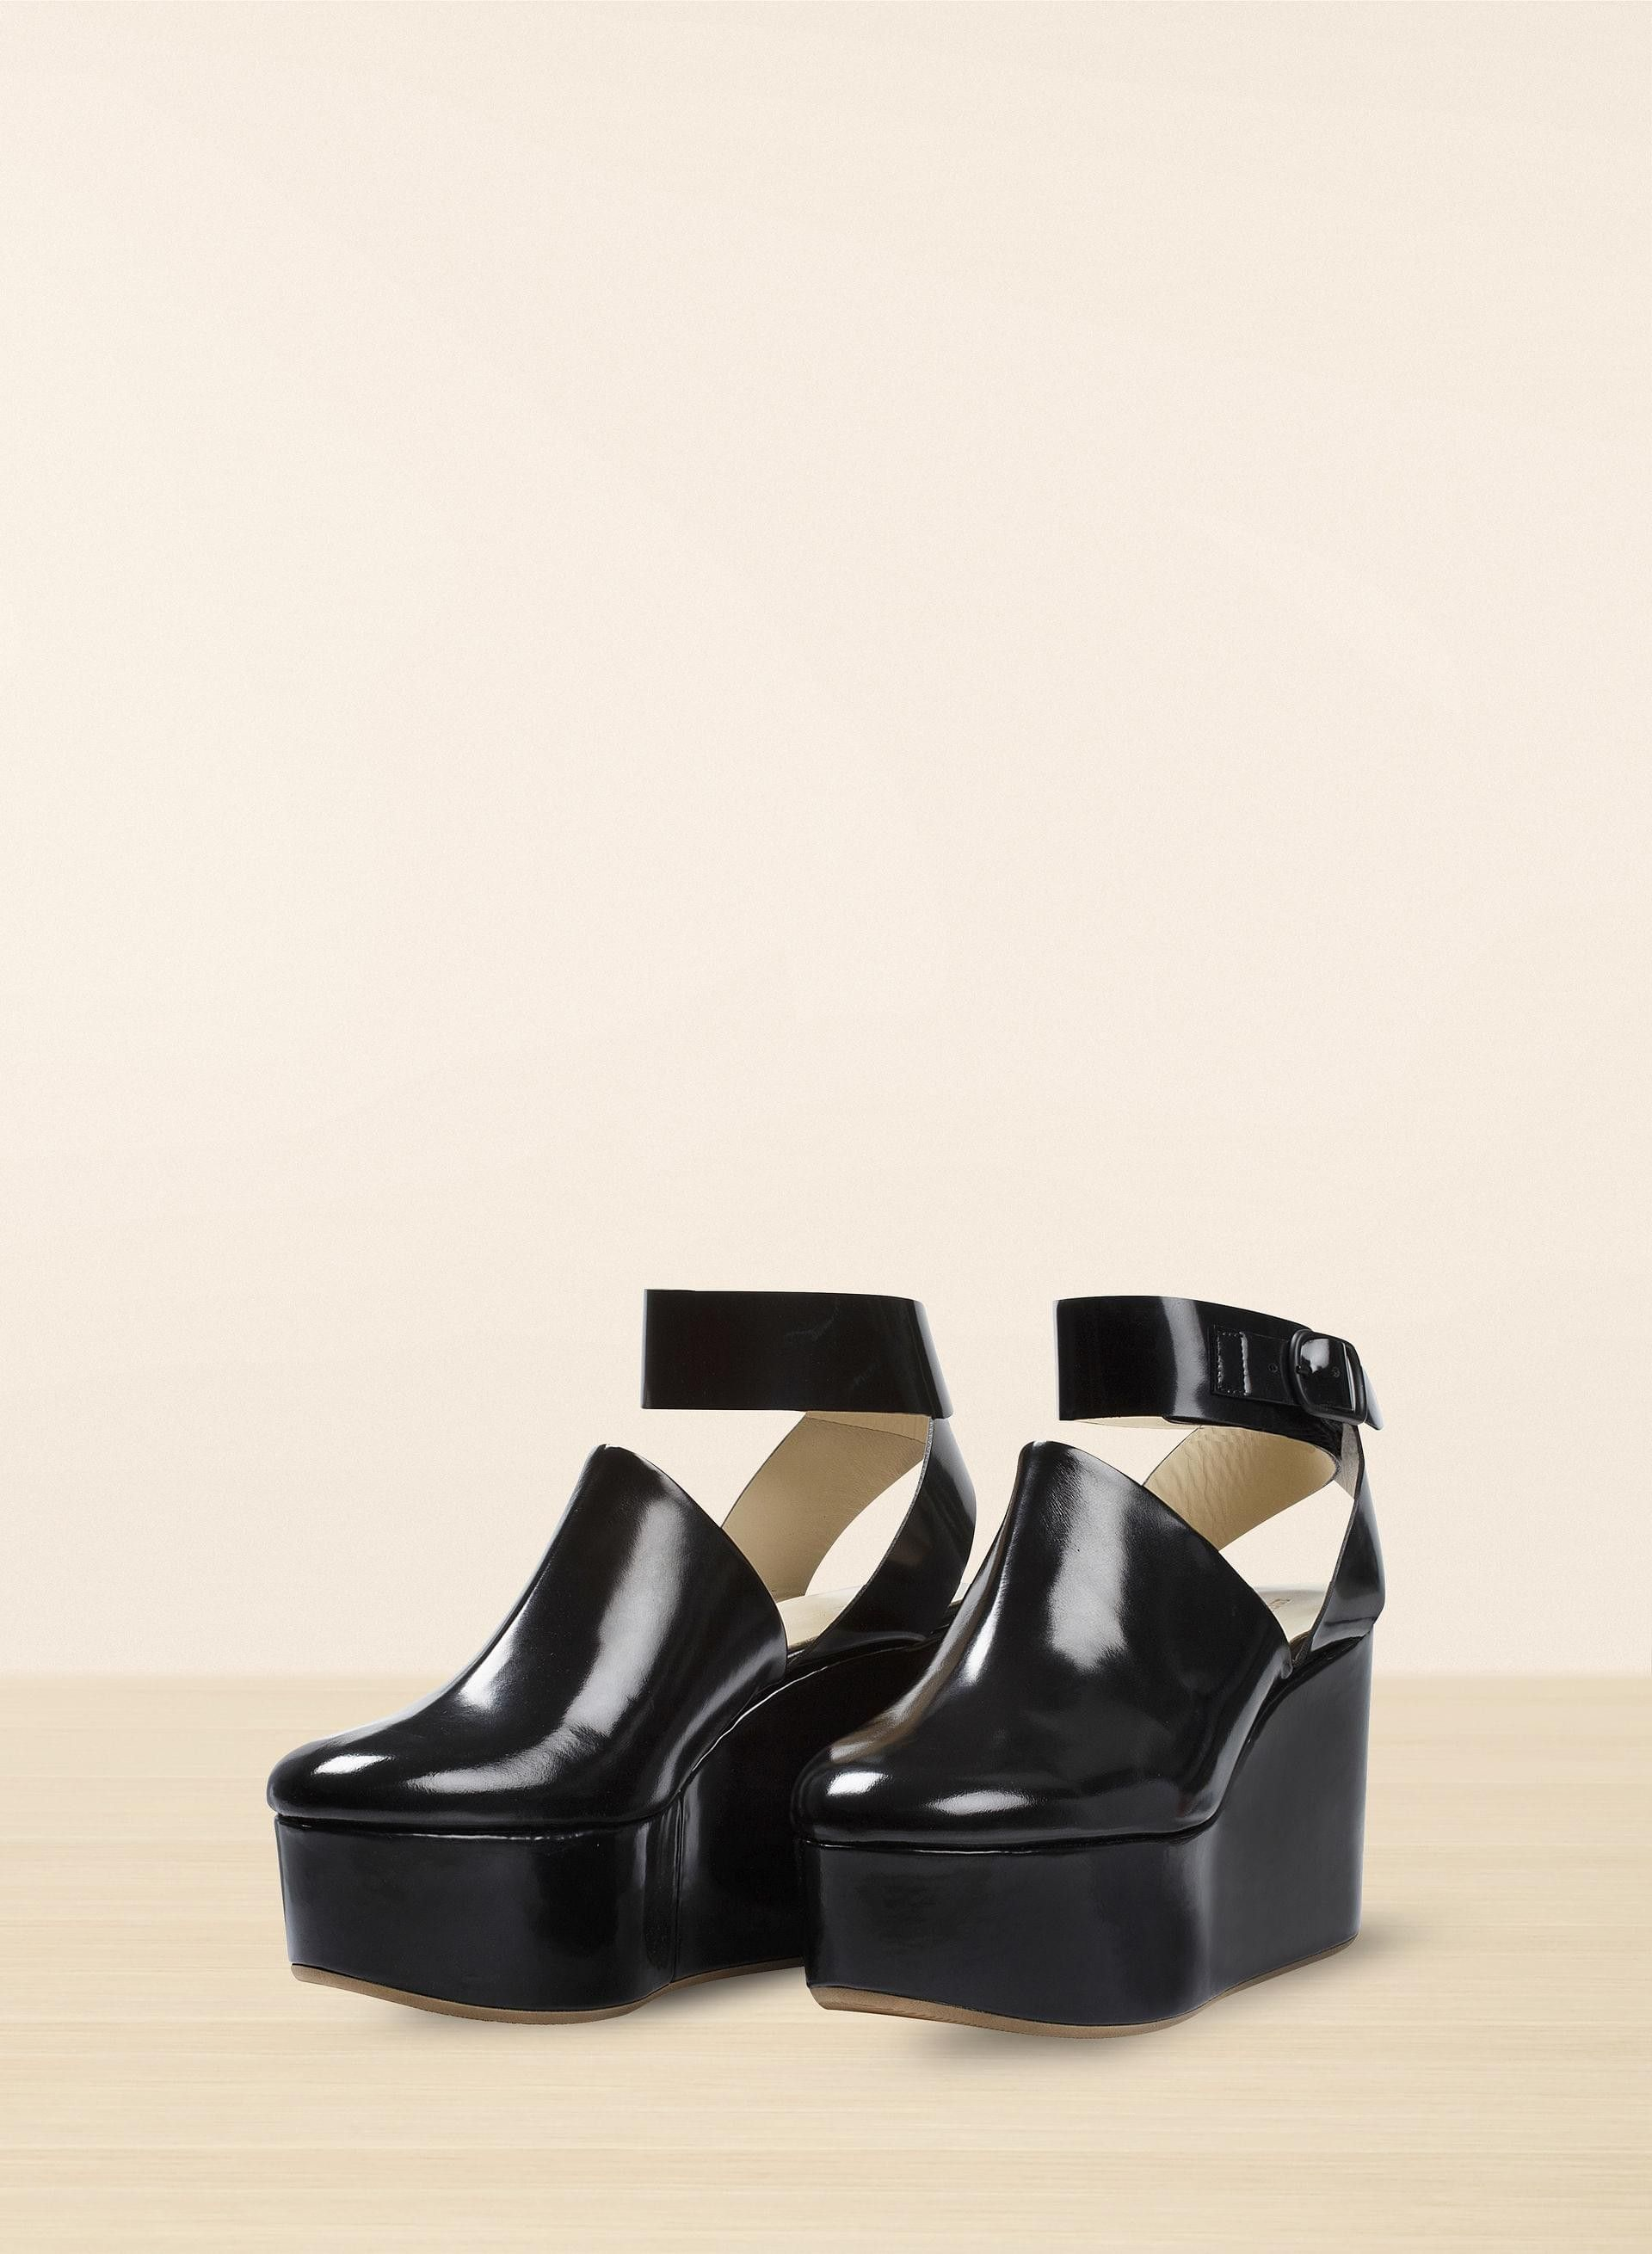 272b3d659261 marimekko black yona shoes